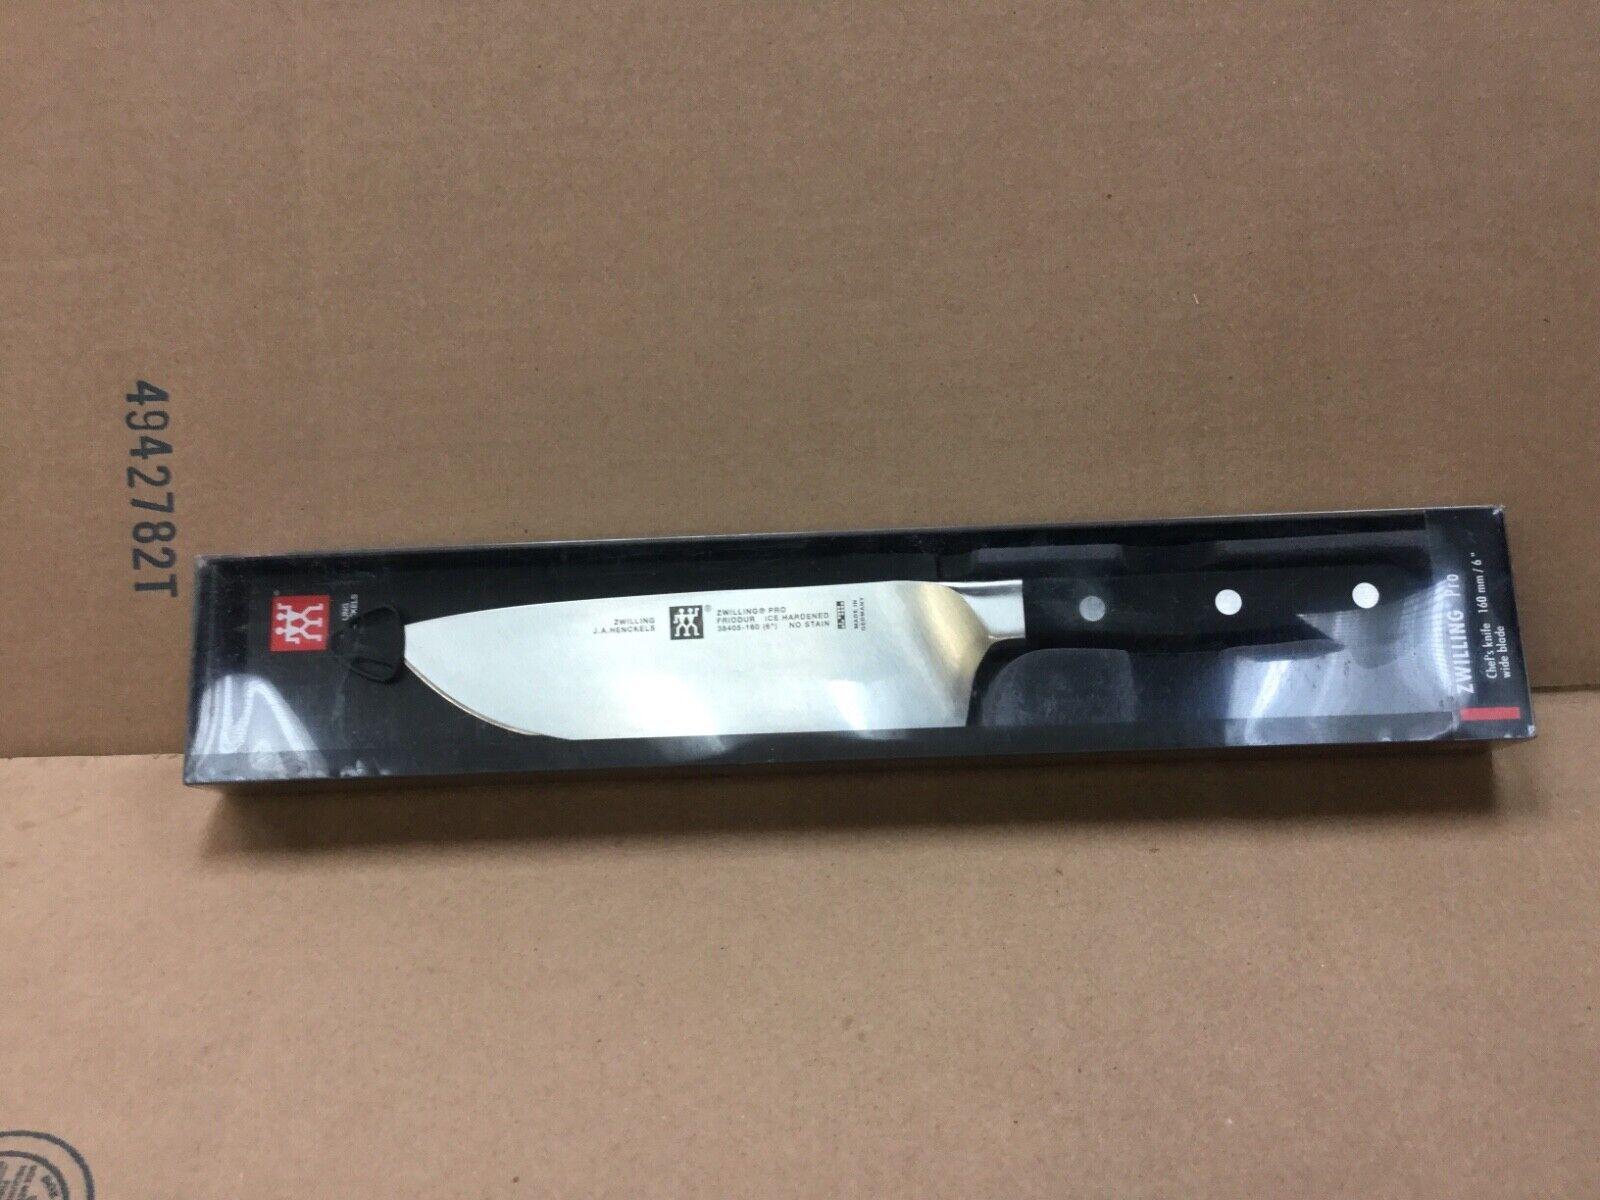 NIB - J.A. Henckels Zwilling Pro 6 inch Wide Blade Chefs Kni